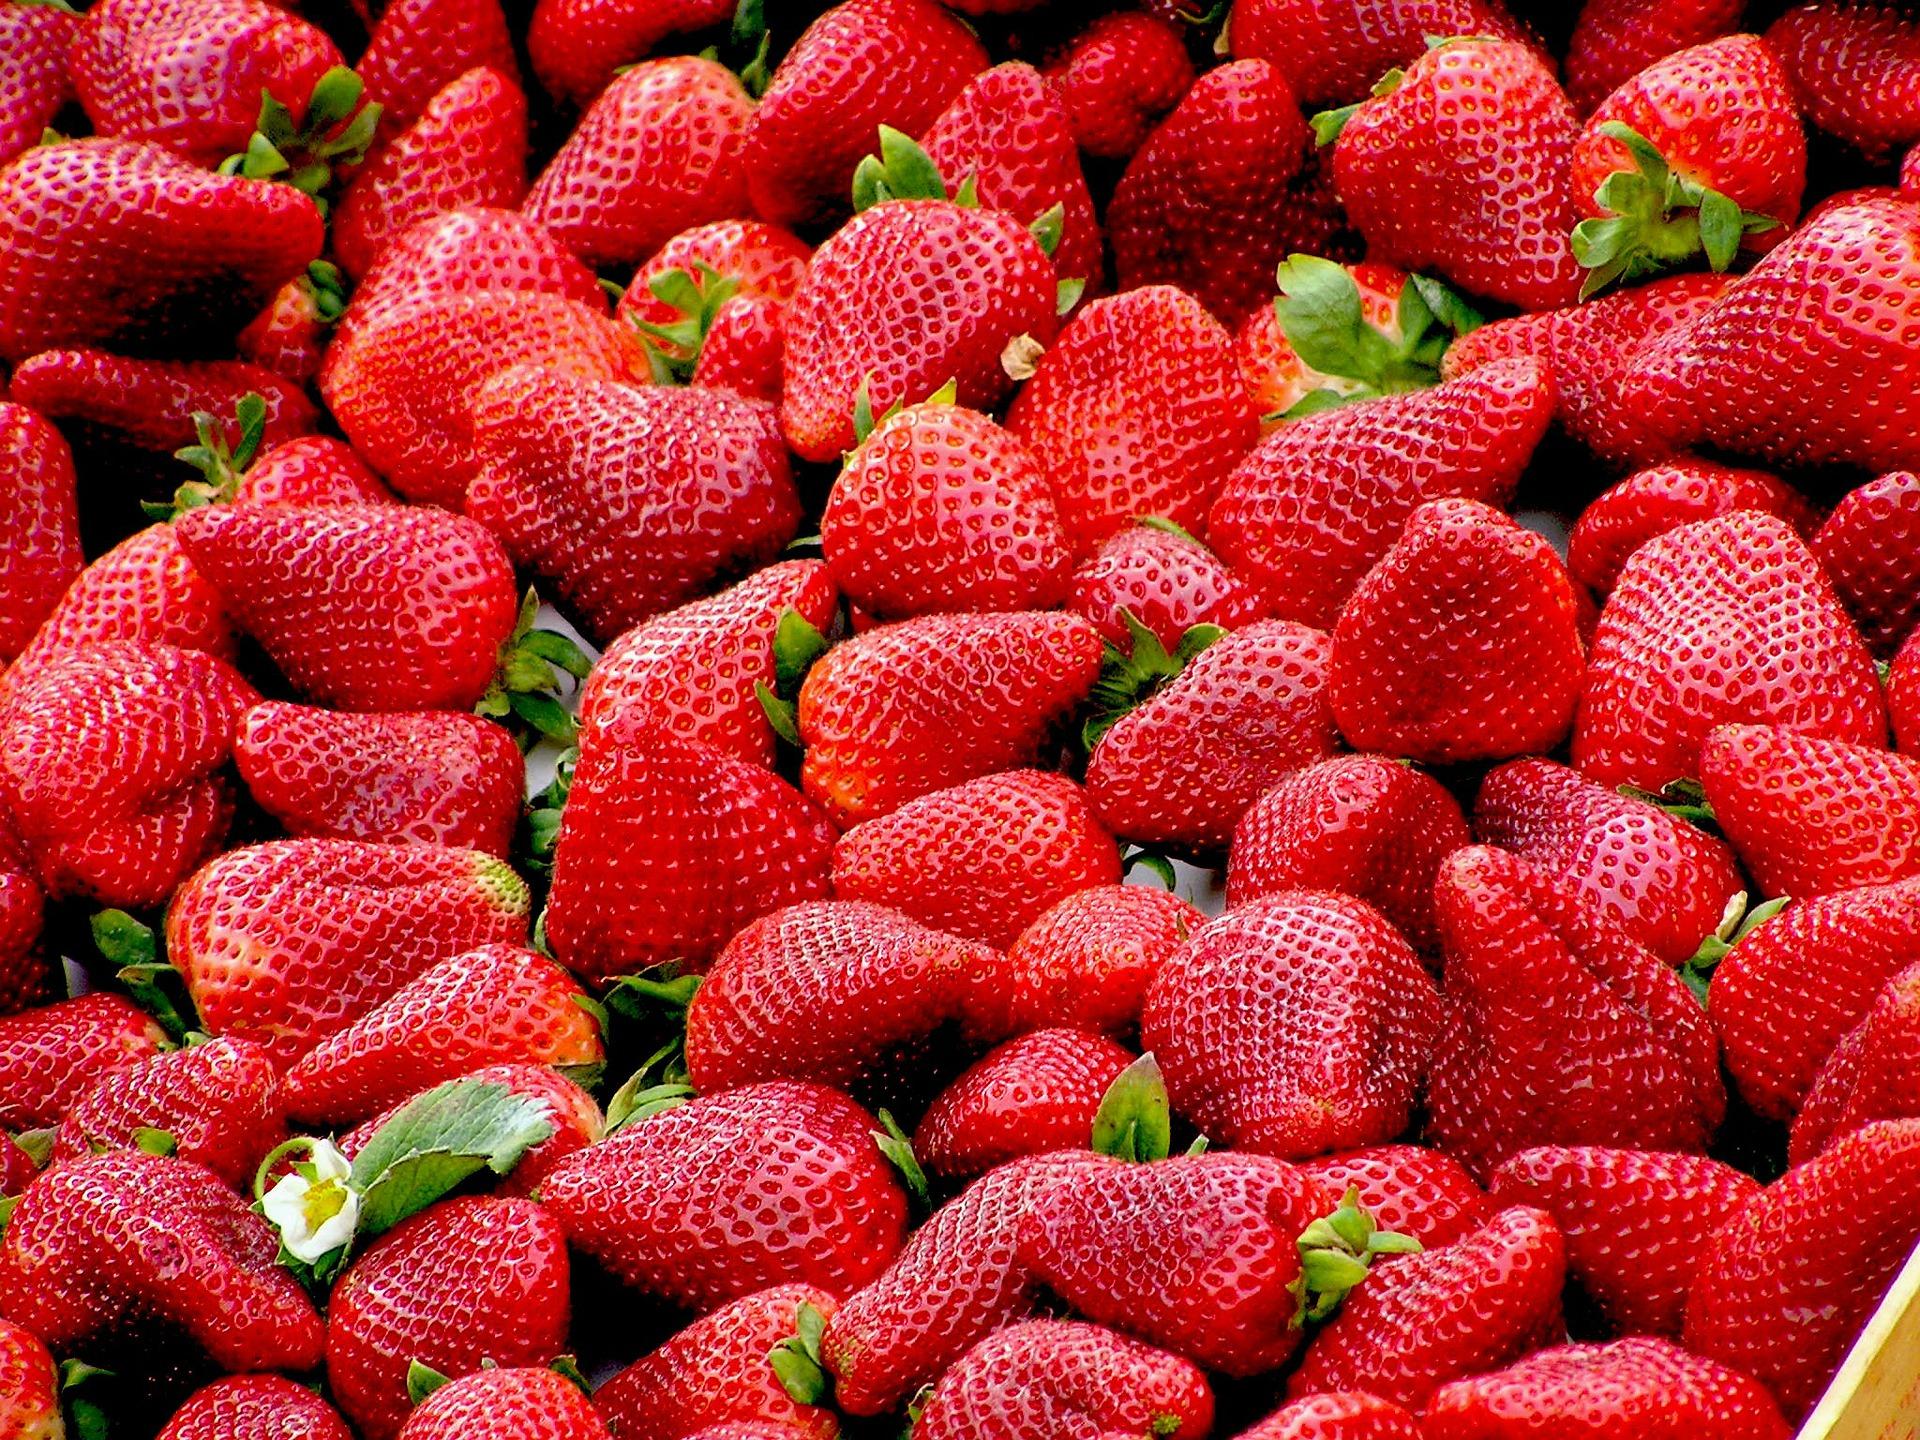 frutas con poca azúcar, fresas.